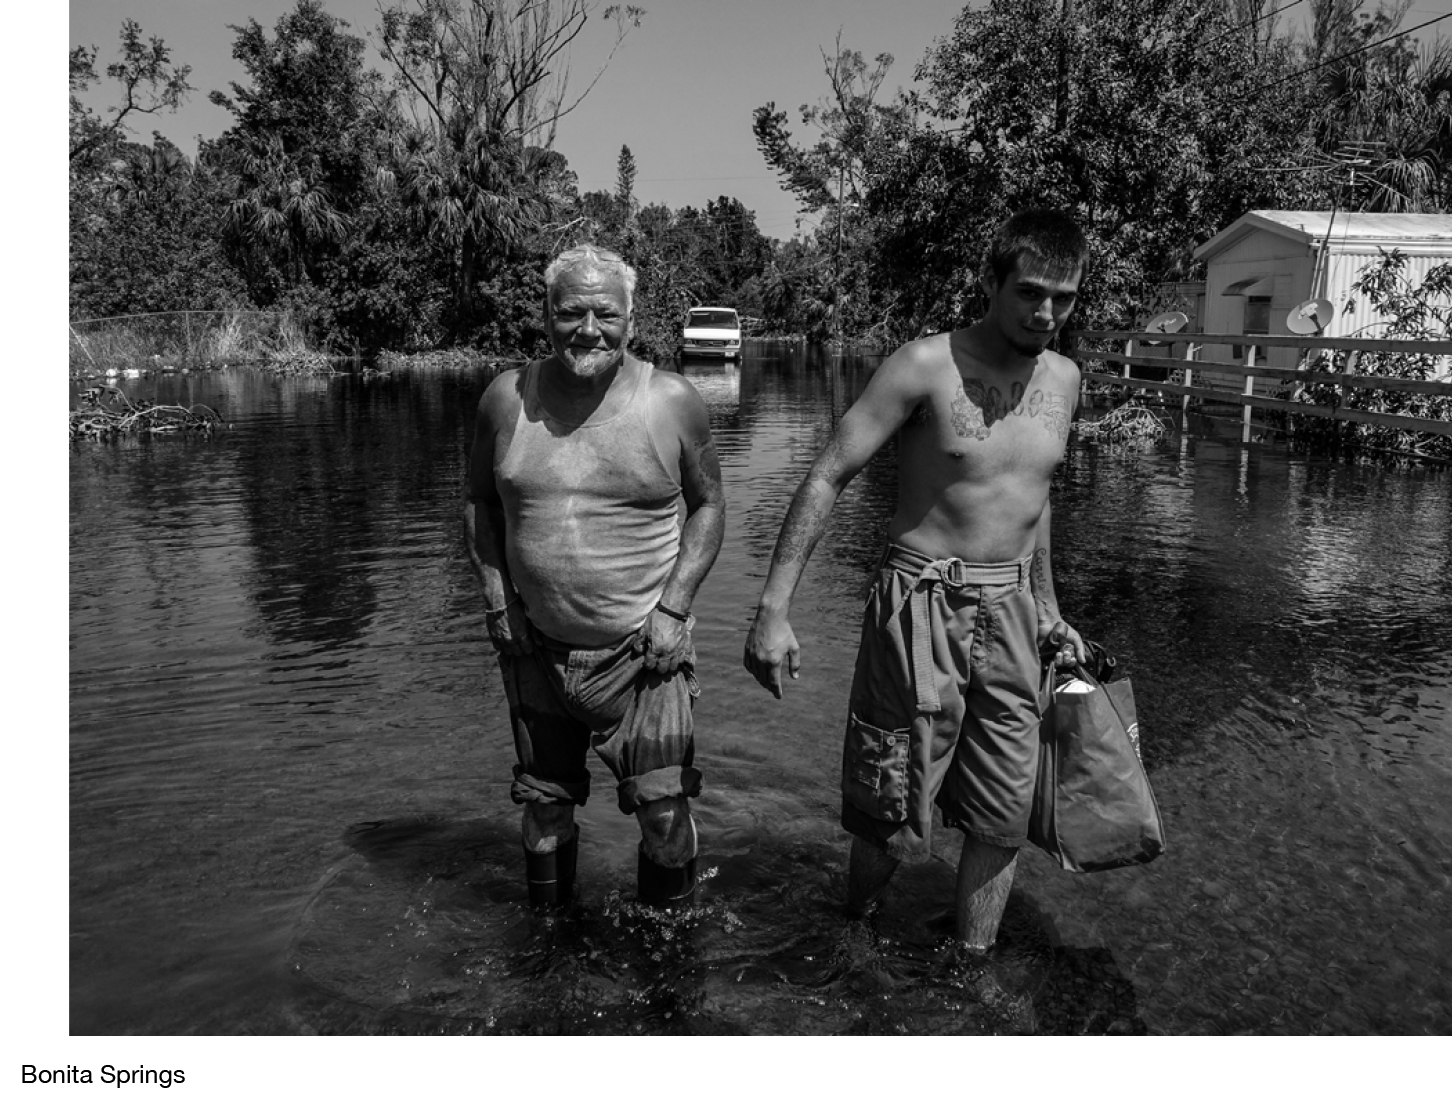 Robert LeBlanc Hurricane Irma %22Welcome To Paradise%22-6.jpg